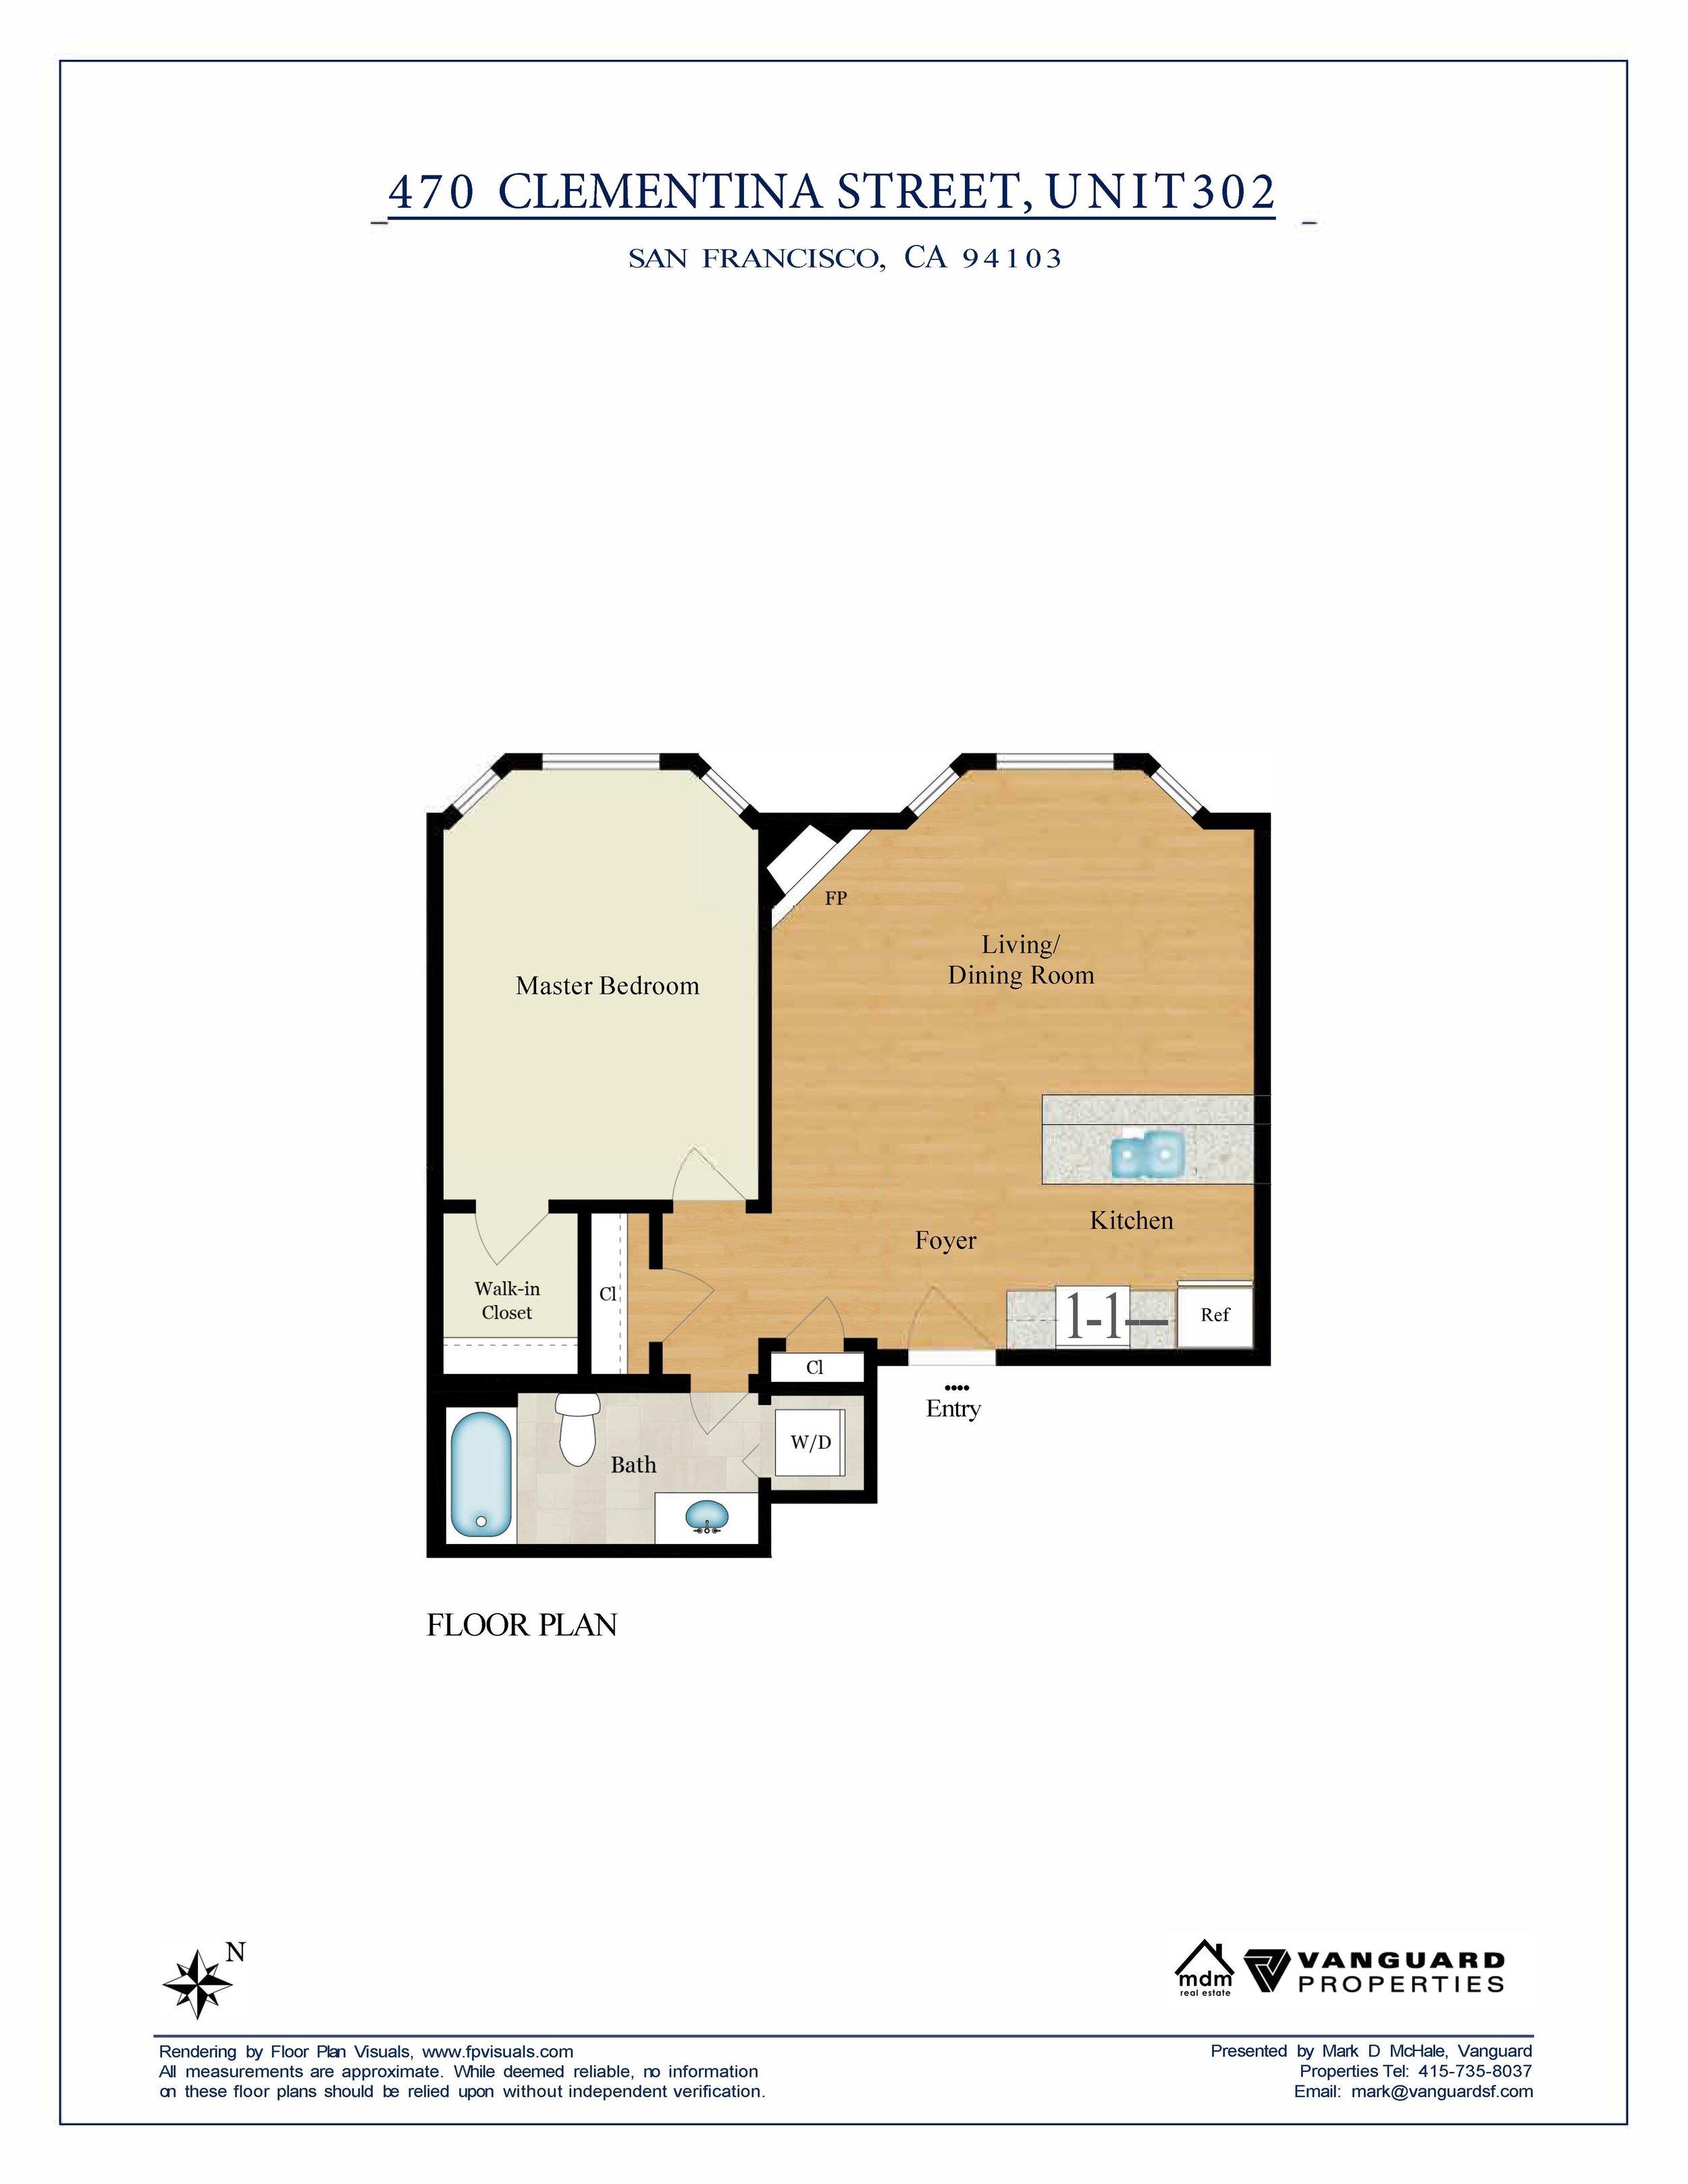 470 Clementina, Unit 302, San Francisco  Floor Plan